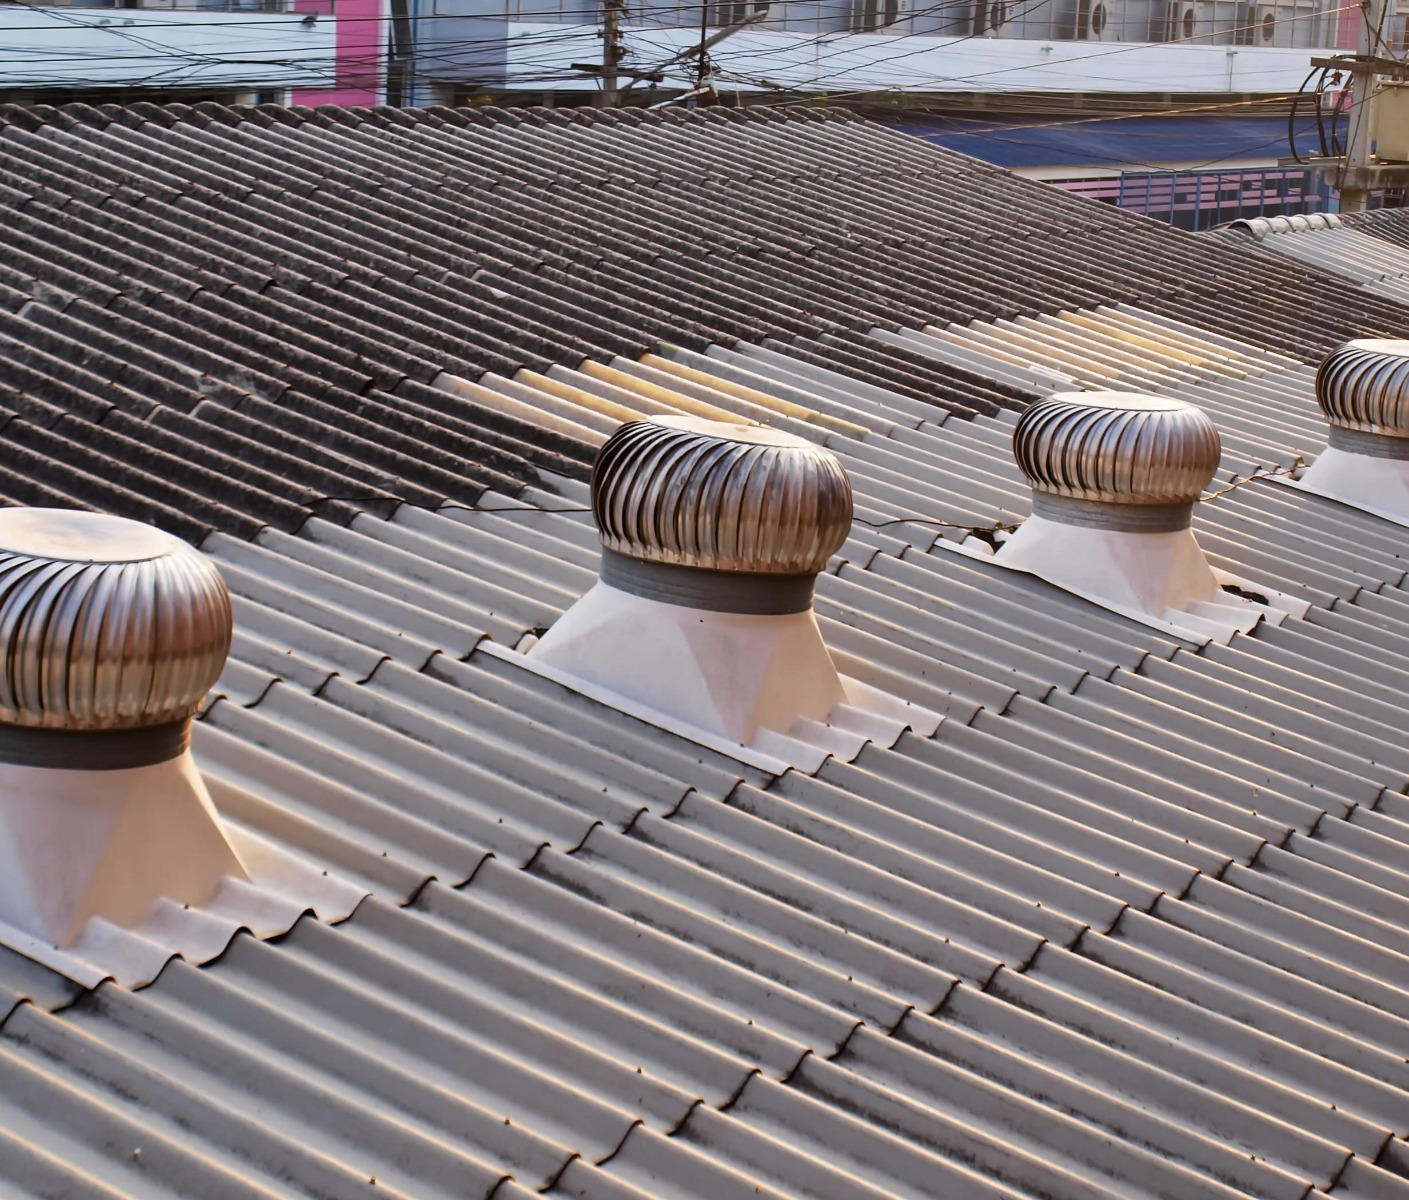 Rooftop Ventilators